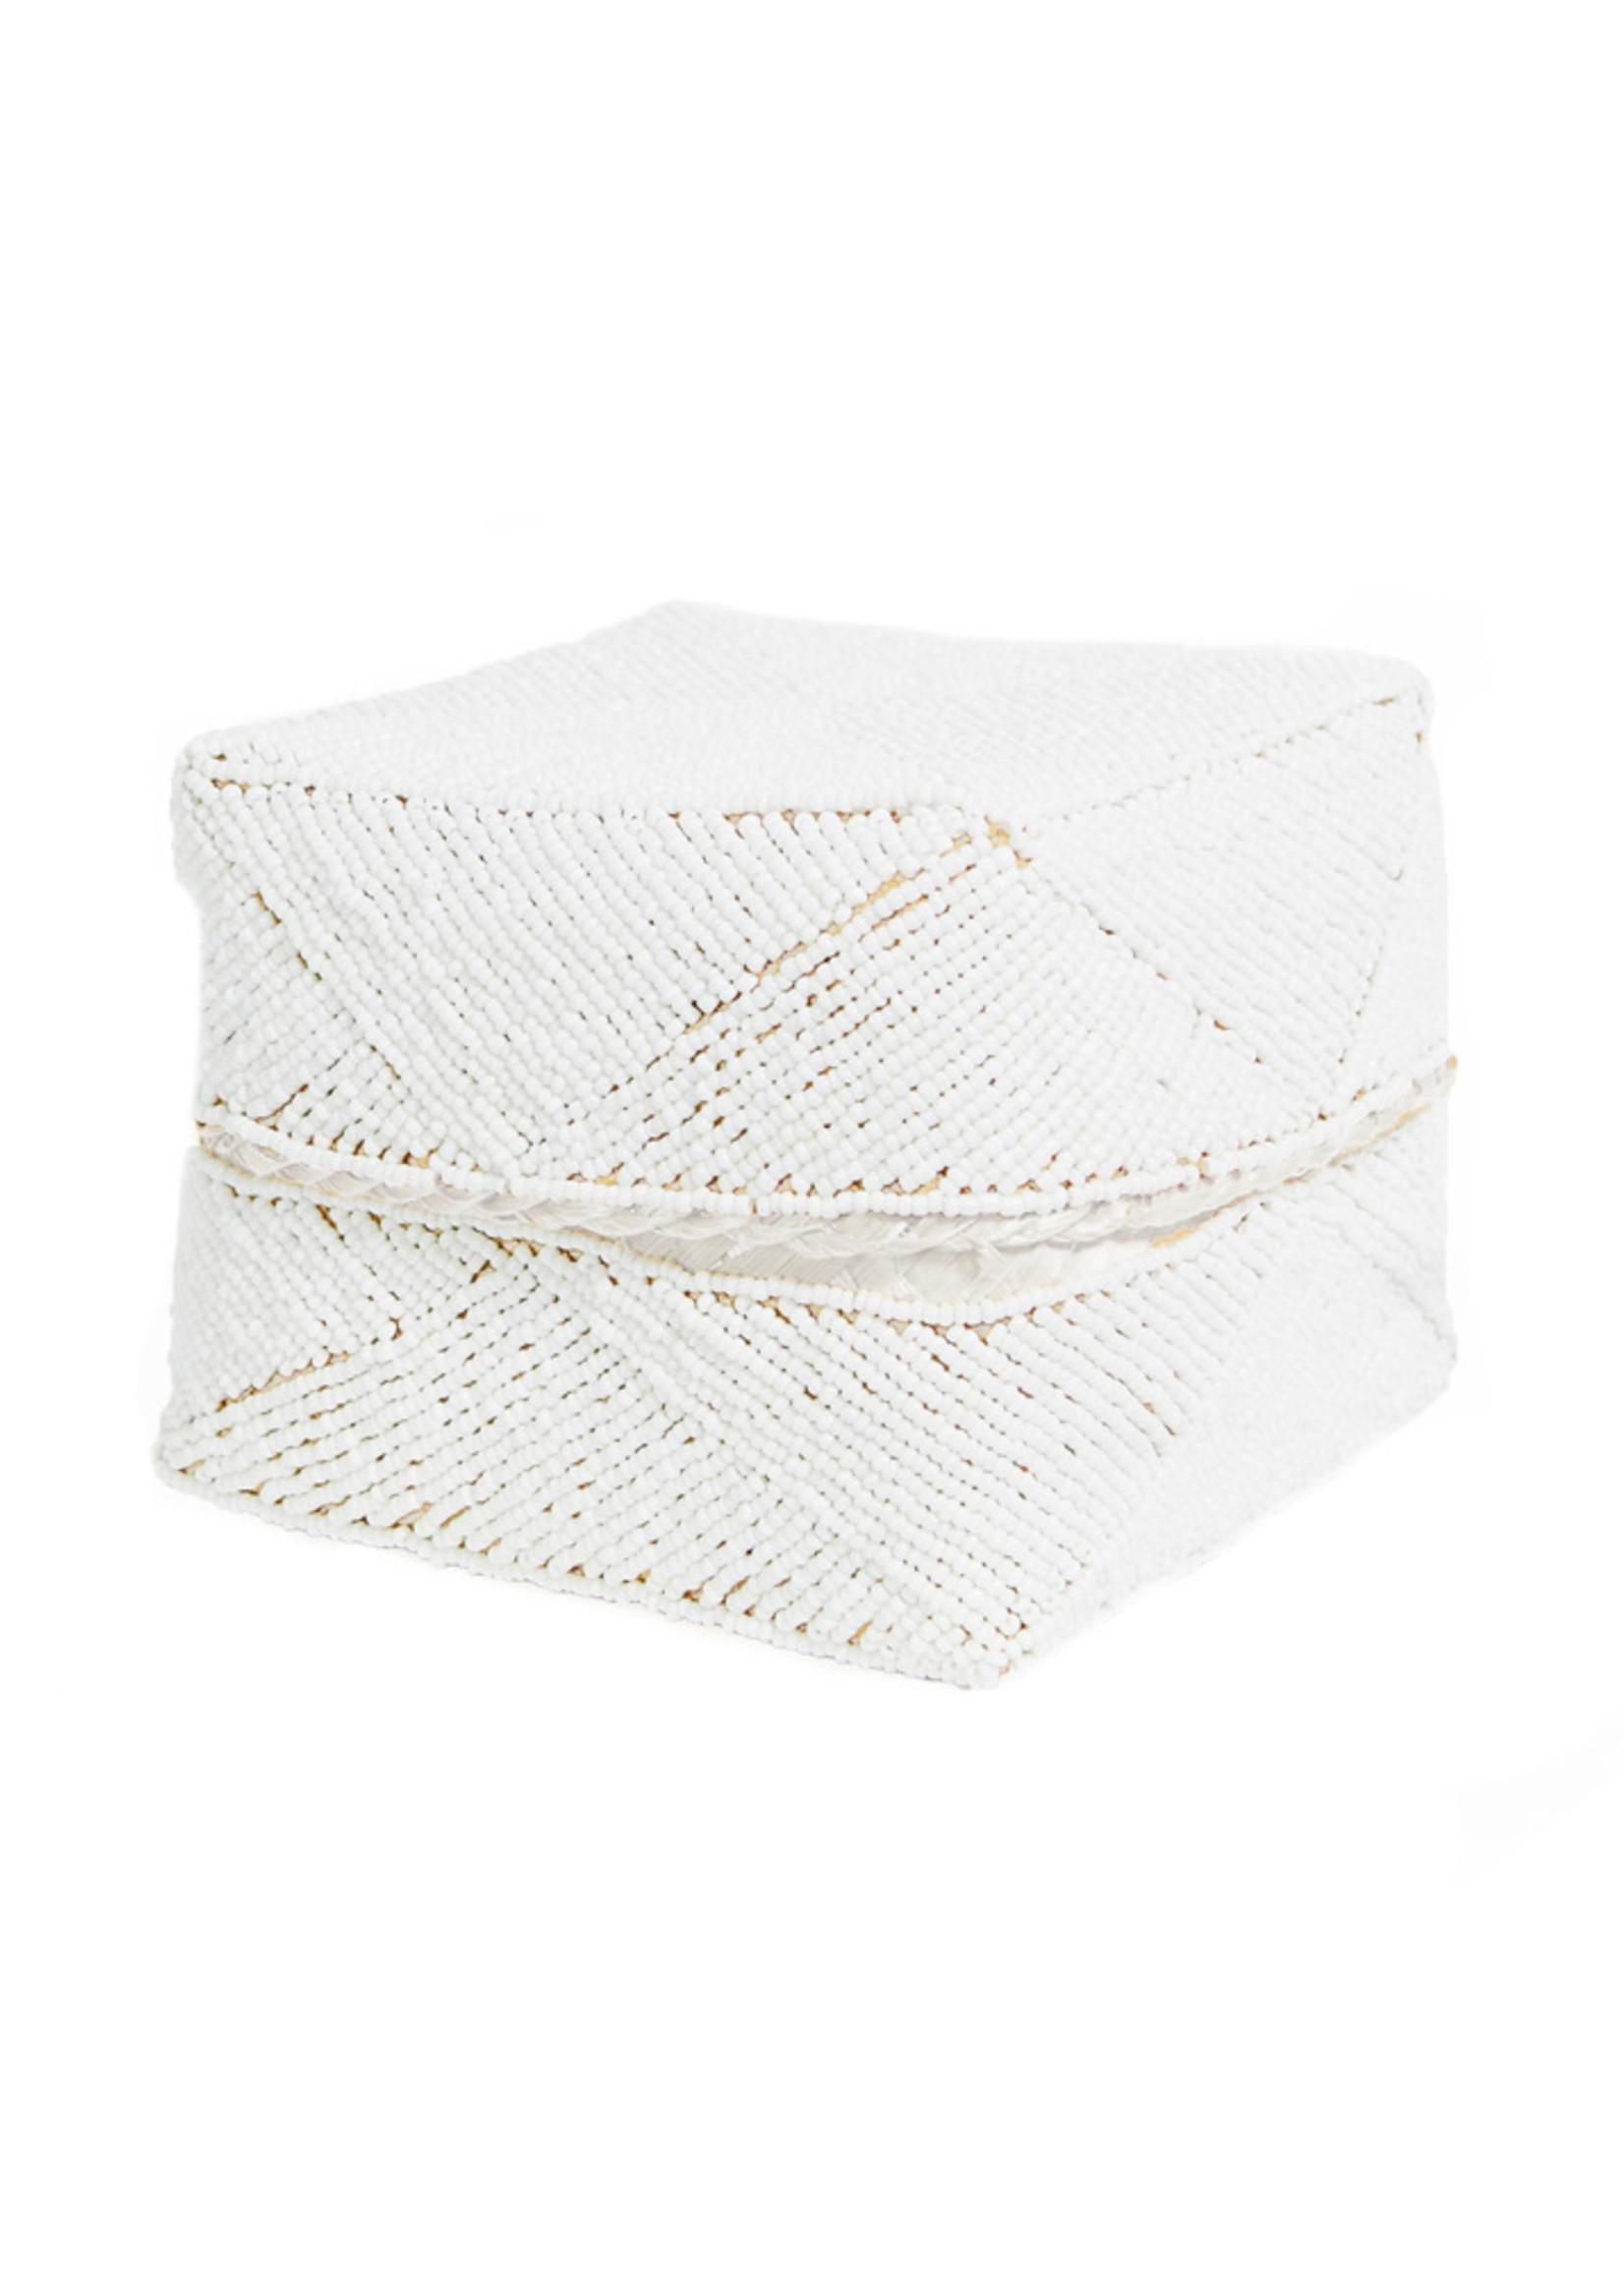 The Beaded Basket - White - M